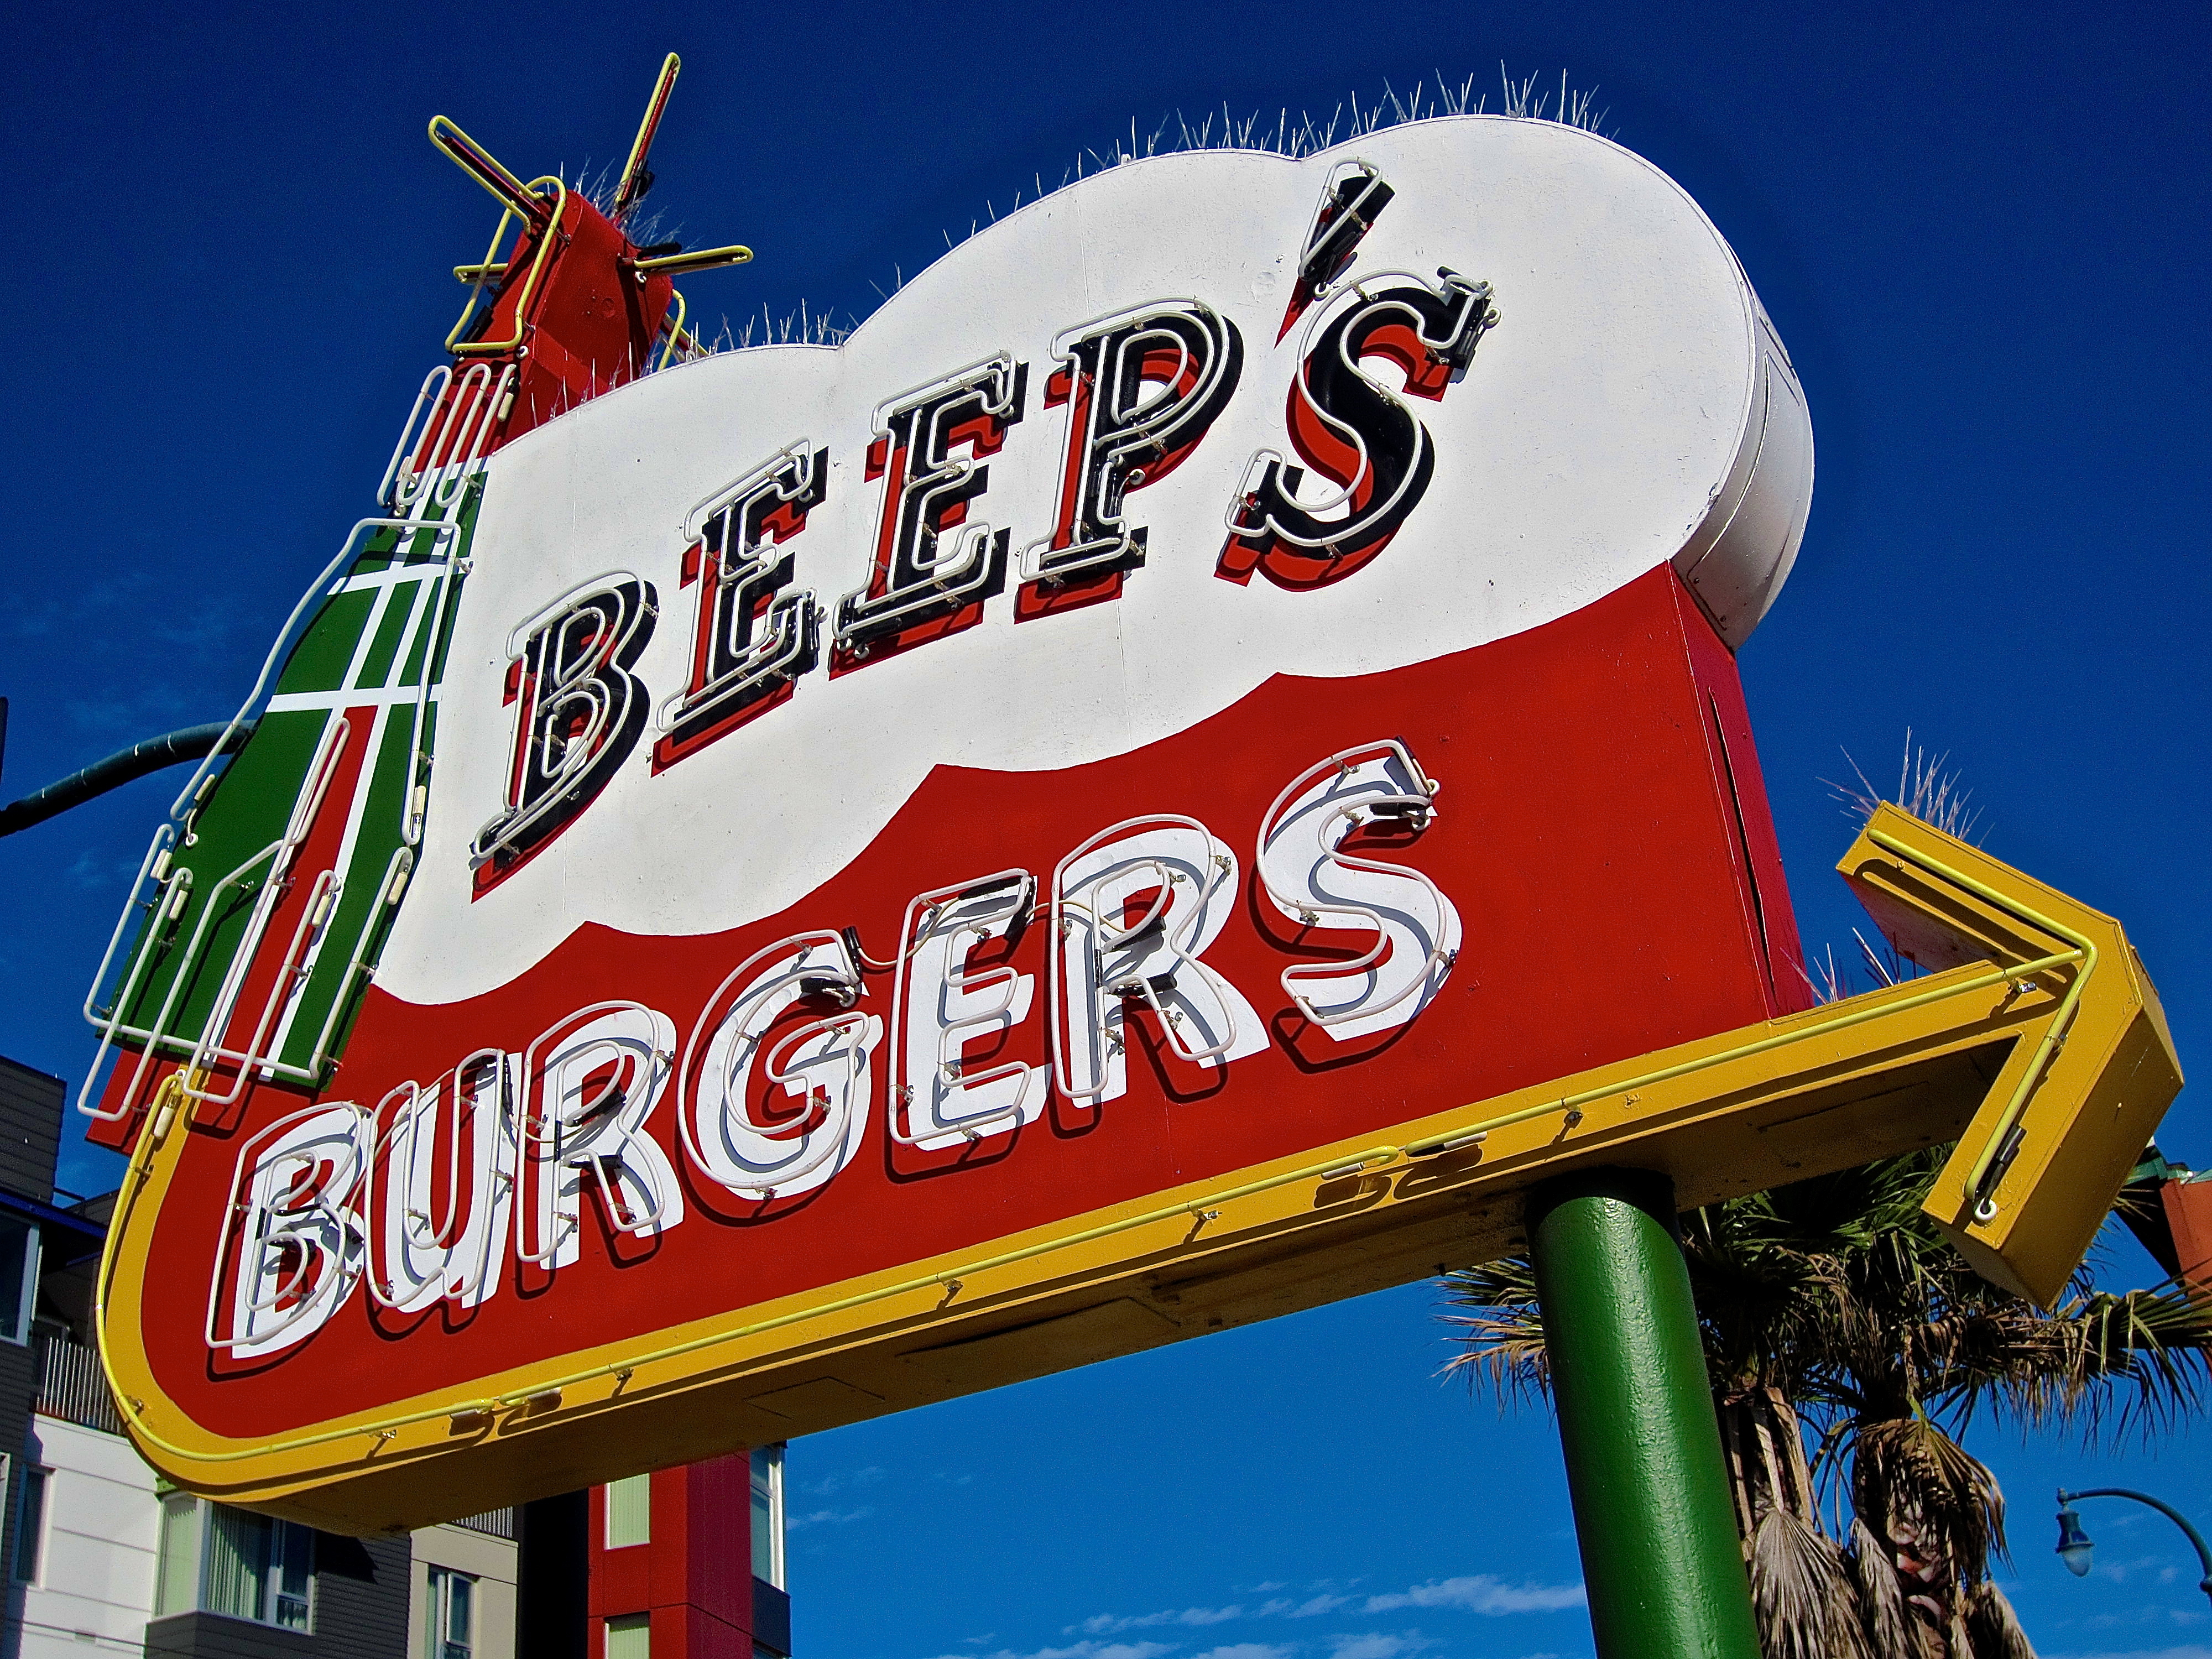 Beep's Burgers - 1051 Ocean Avenue, San Francisco, California U.S.A. - September 26, 2015